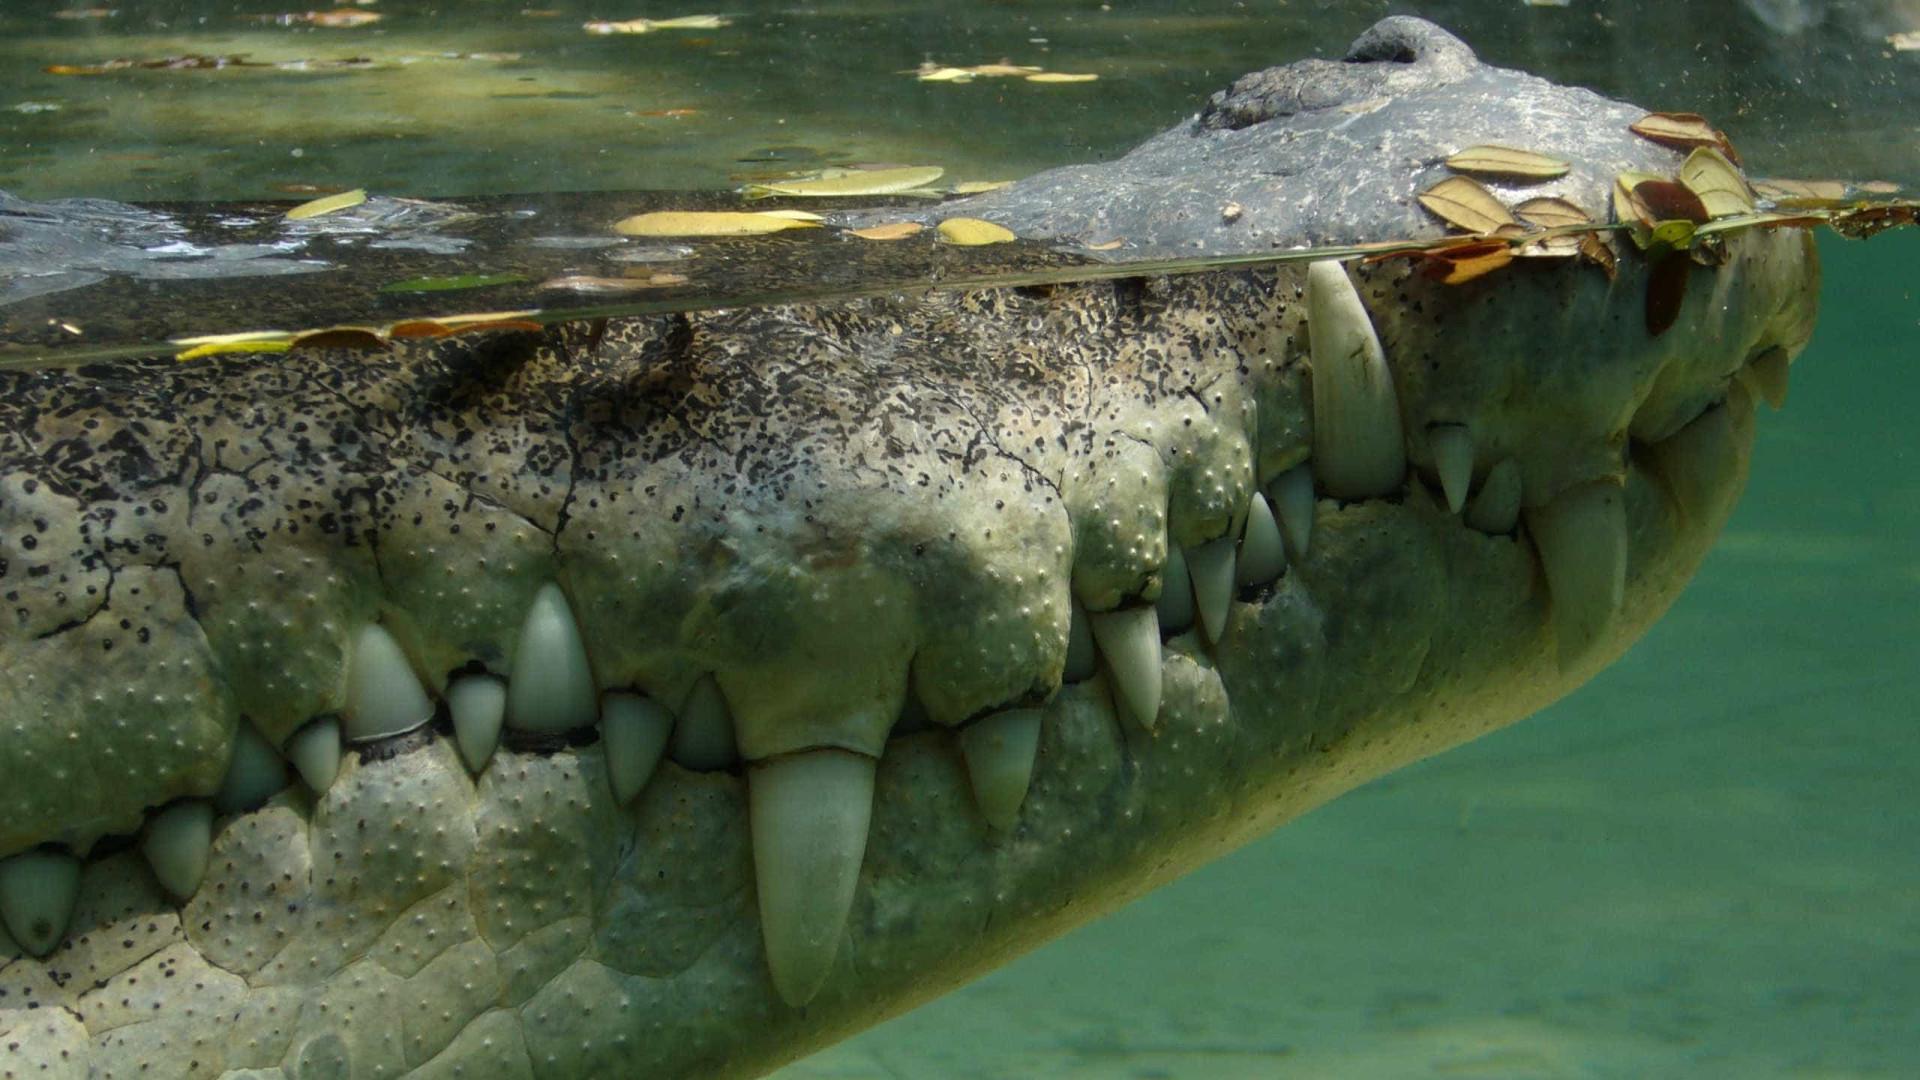 Foi desafiado a atravessar rio de crocodilos. Sobreviveu por pouco